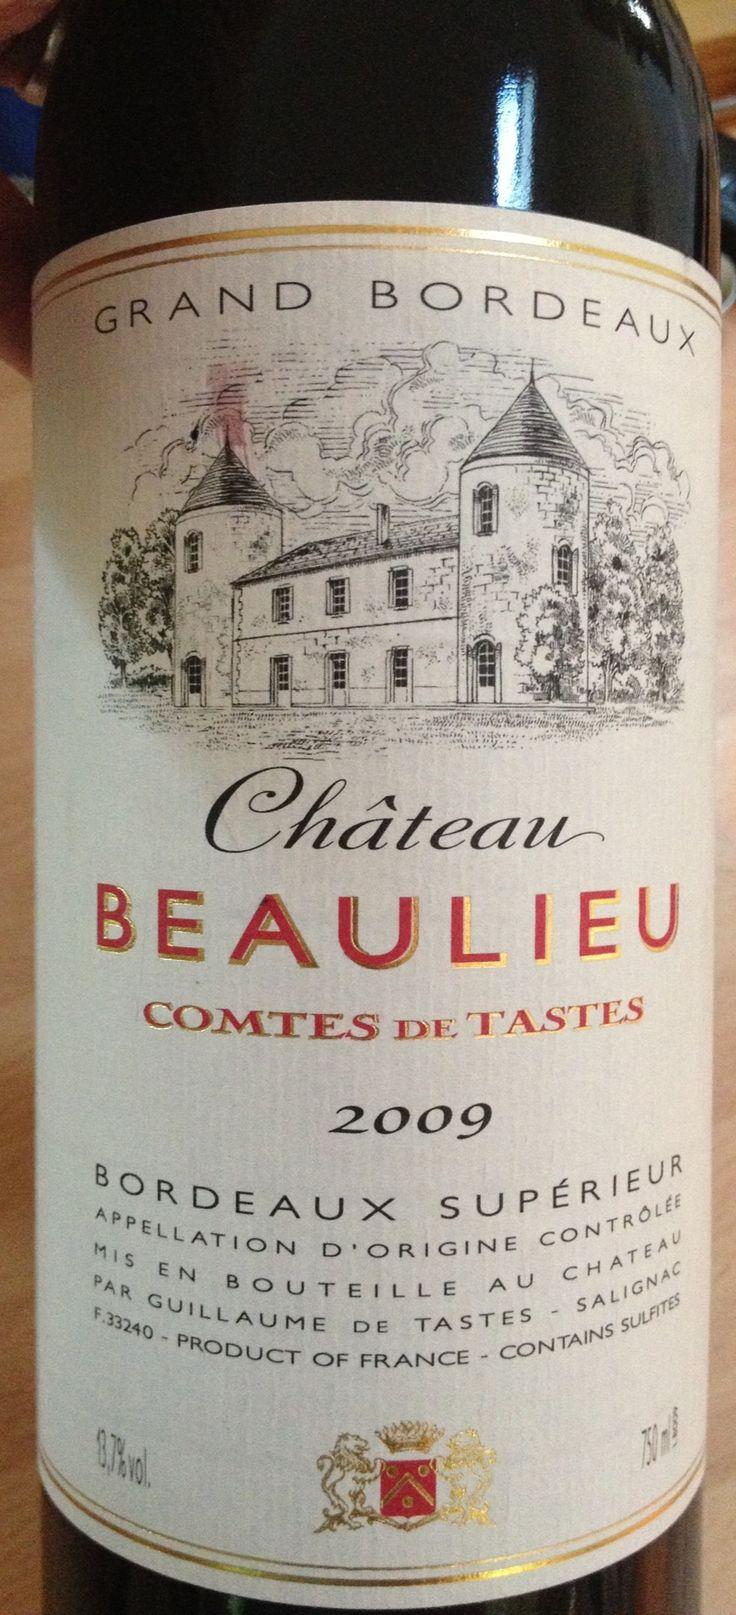 Ch. Beaulieu 09 from Thos Peatling, Bury St Edmunds. £15.11 - opaque deep purple. Subtle aromas. Already integrated, but light, flavours.